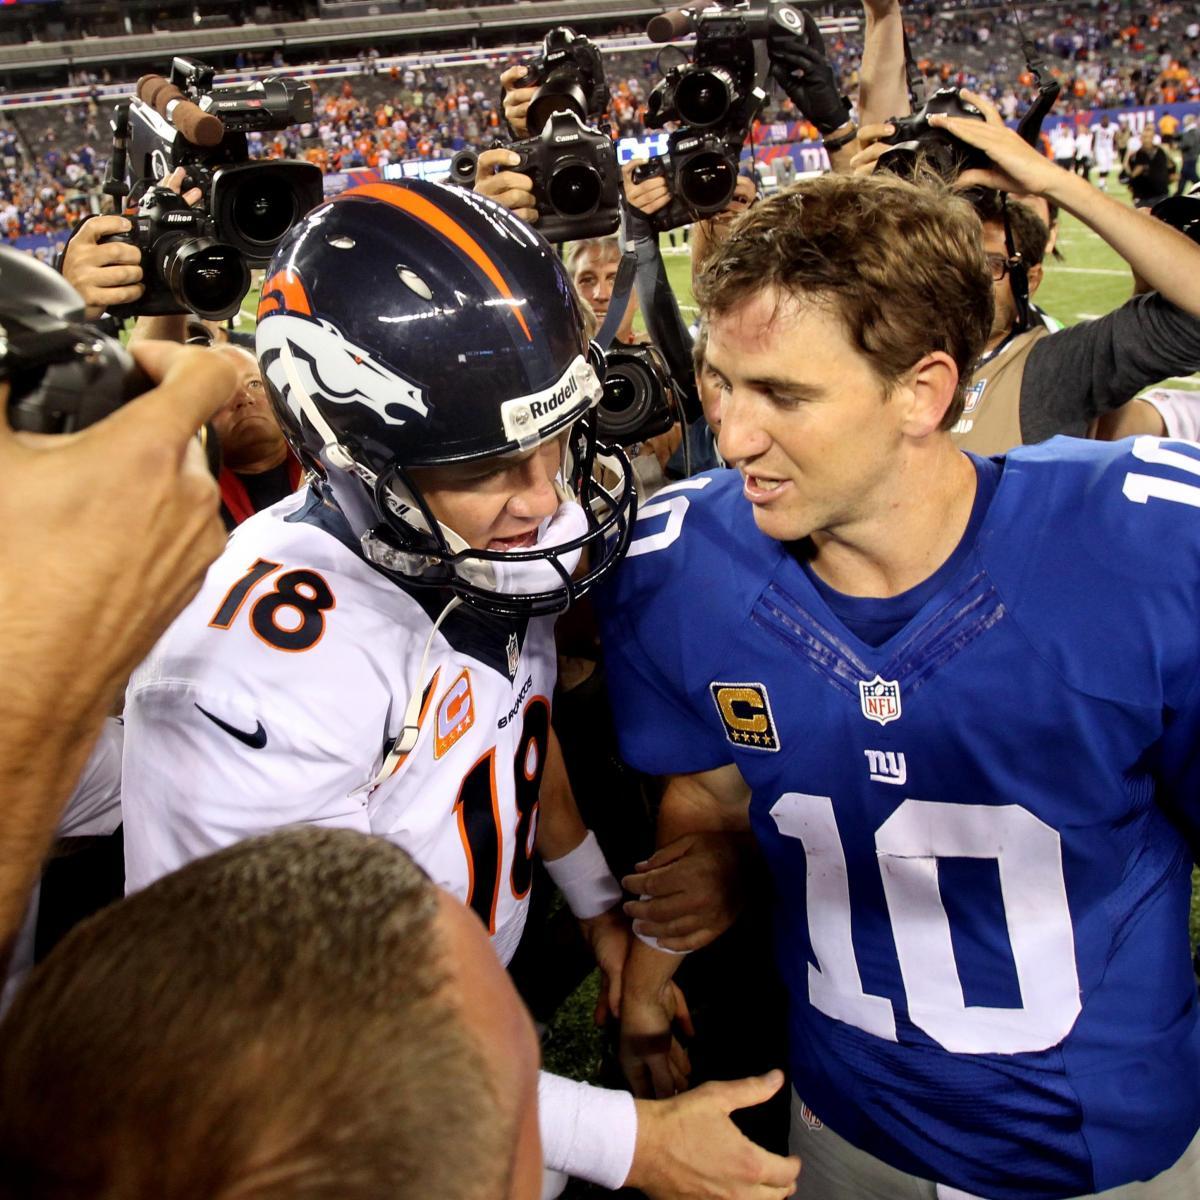 Broncos Vs. Giants: 8 Takeaways From Denver's 41-23